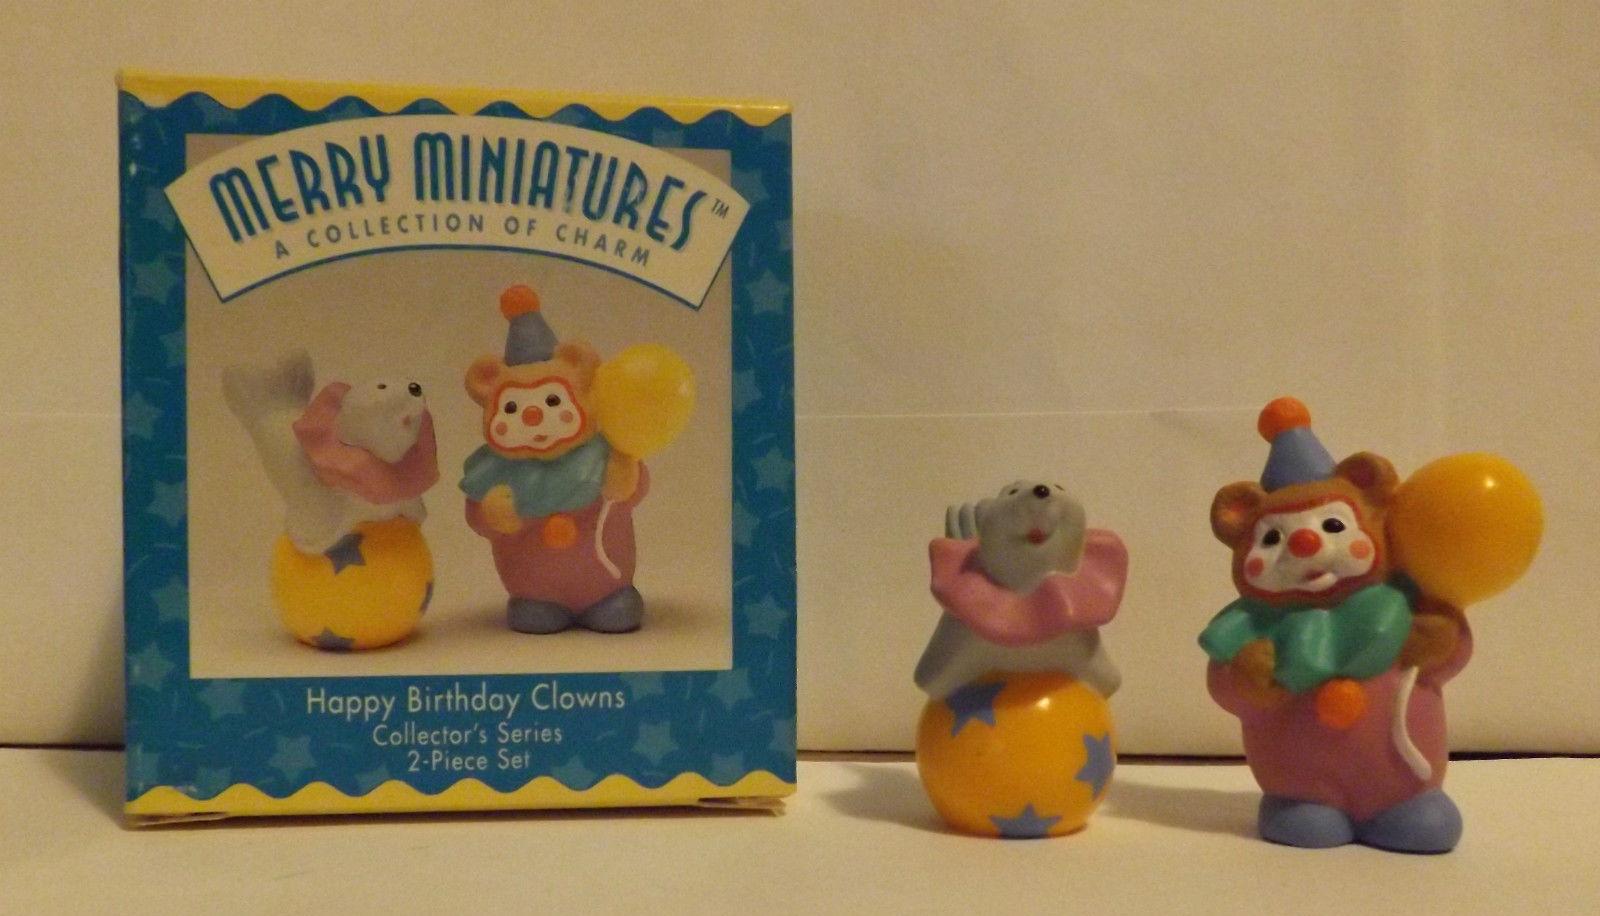 Hallmark Merry Miniatures Happy Birthday Clowns 2-Piece Set 1996